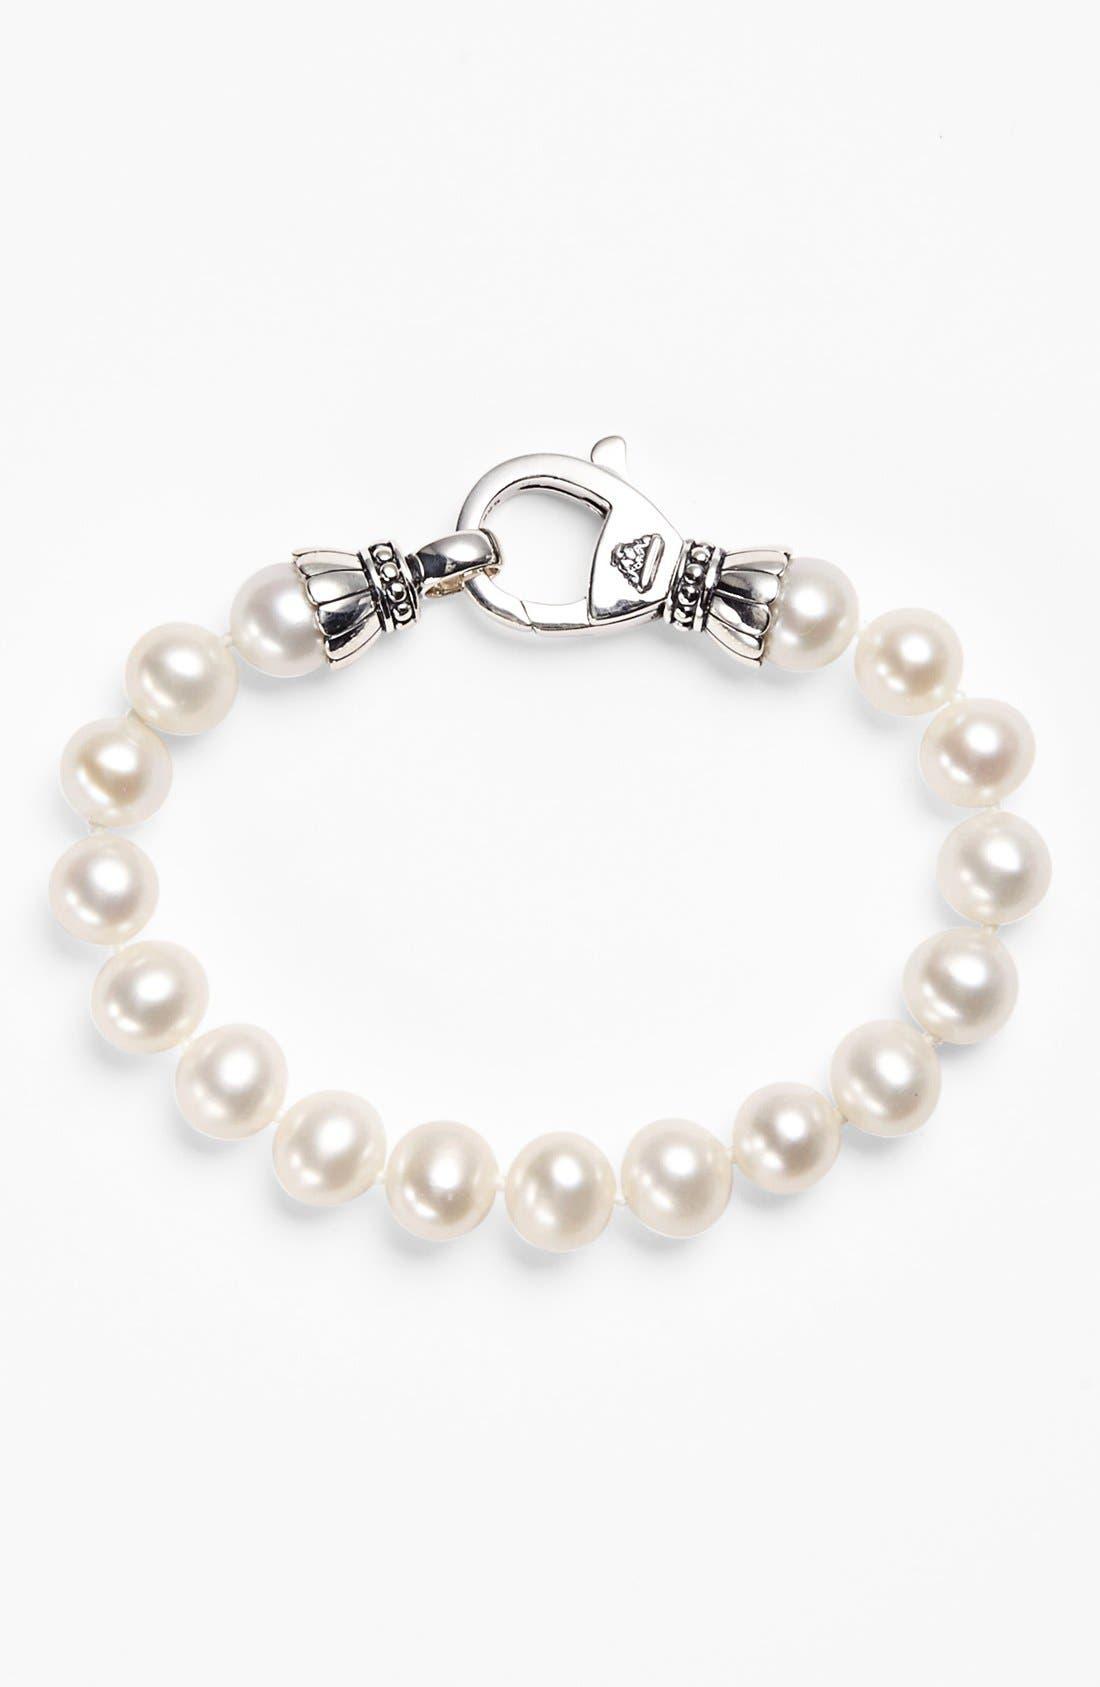 LAGOS Luna 9mm Pearl Bracelet